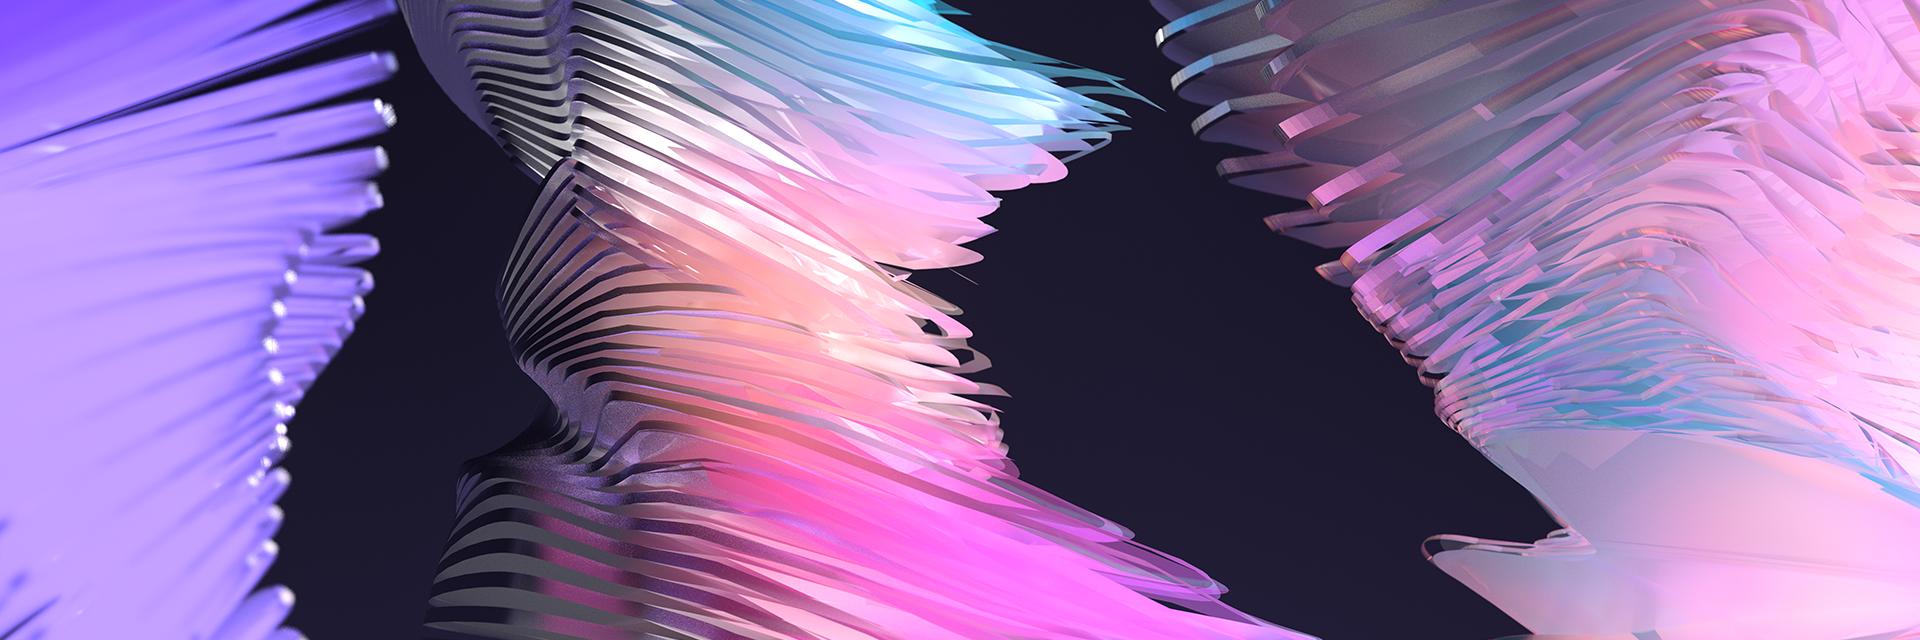 AdobeMax_2019_1920x640_0019_stage_design_2